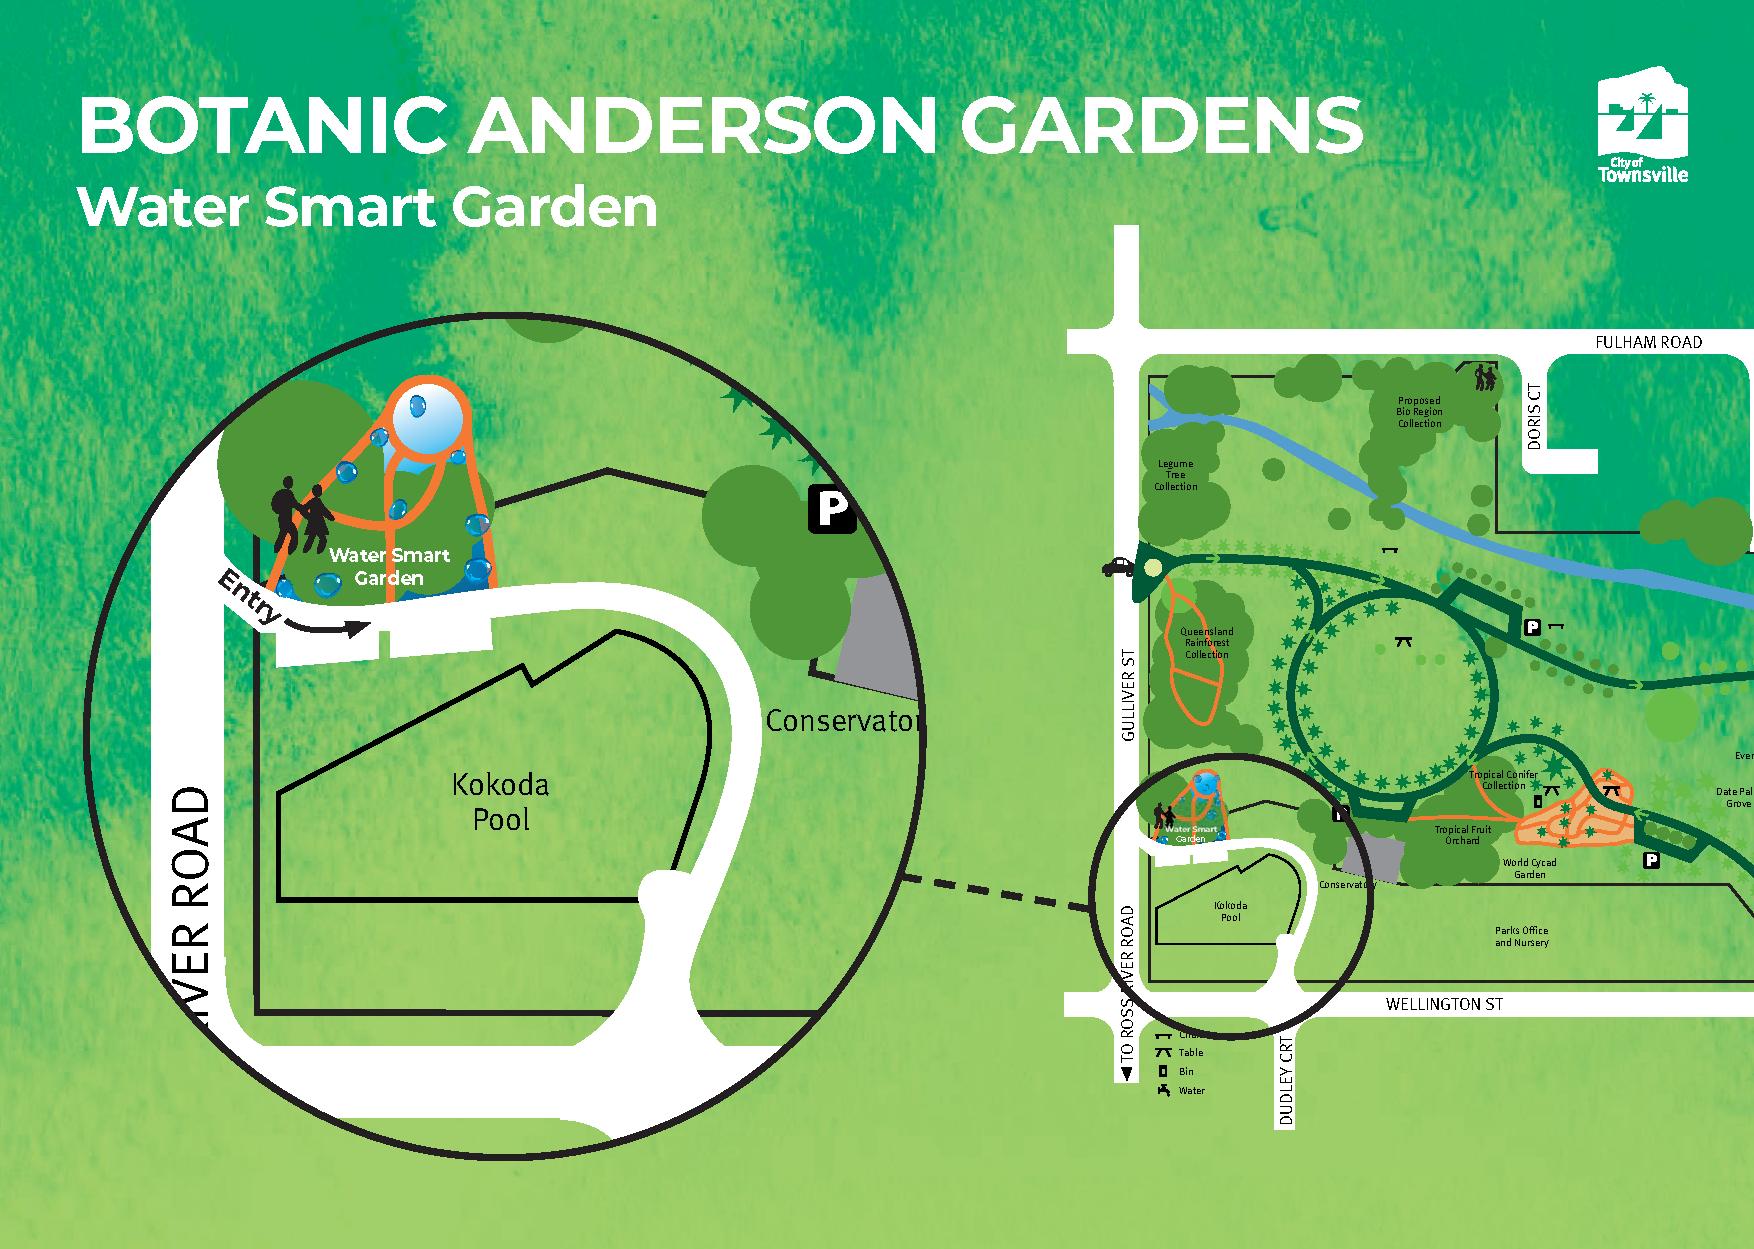 Water Smart Garden - Anderson Gardens Map